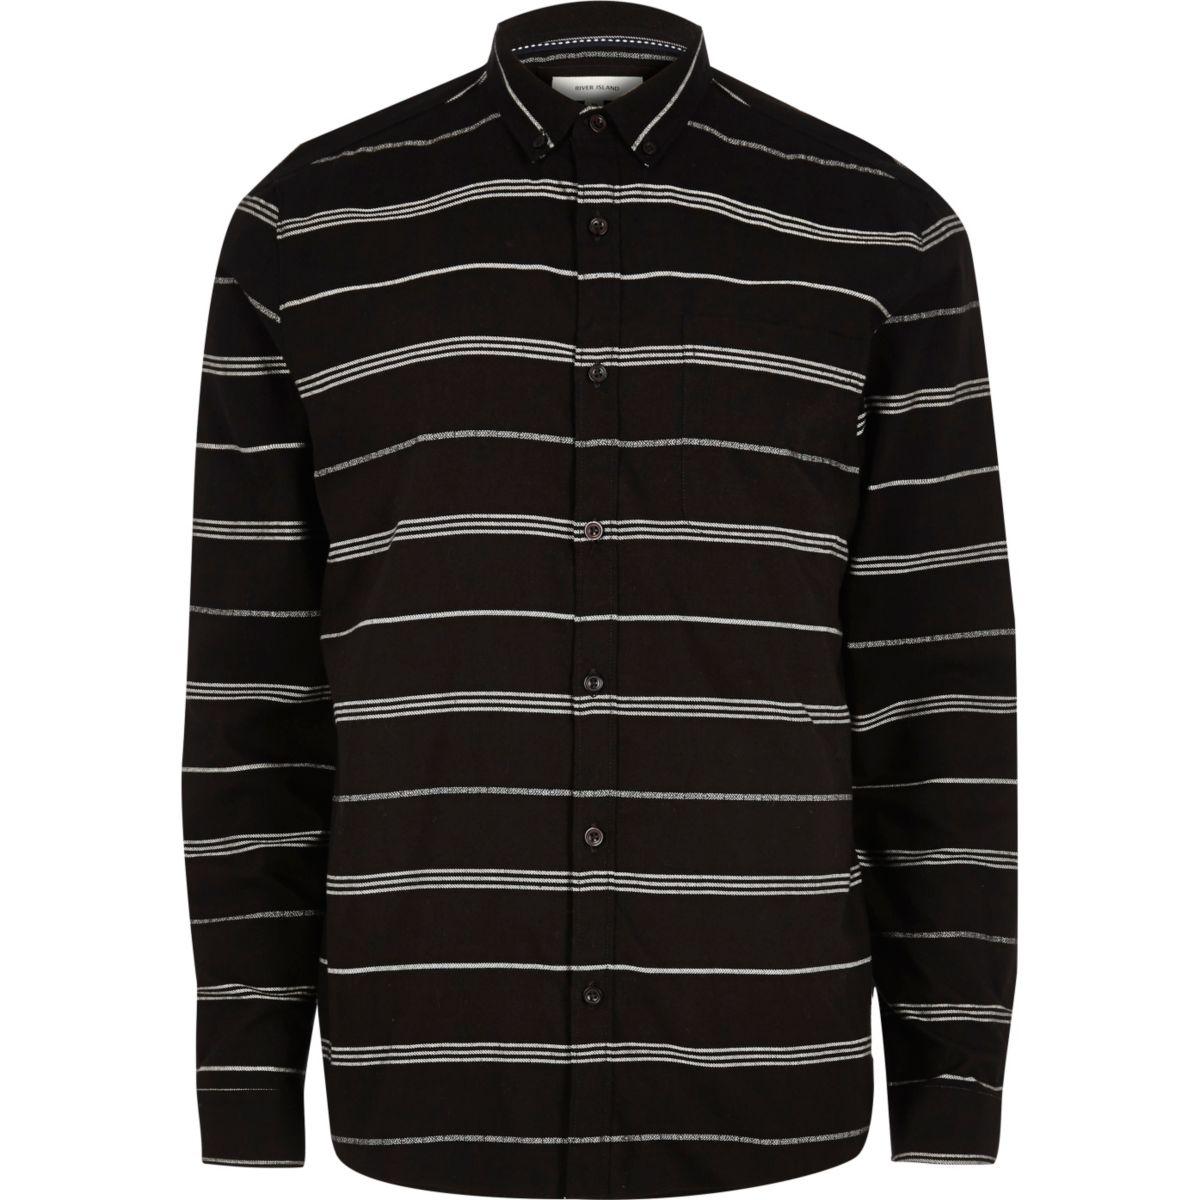 Black stripe long sleeve shirt